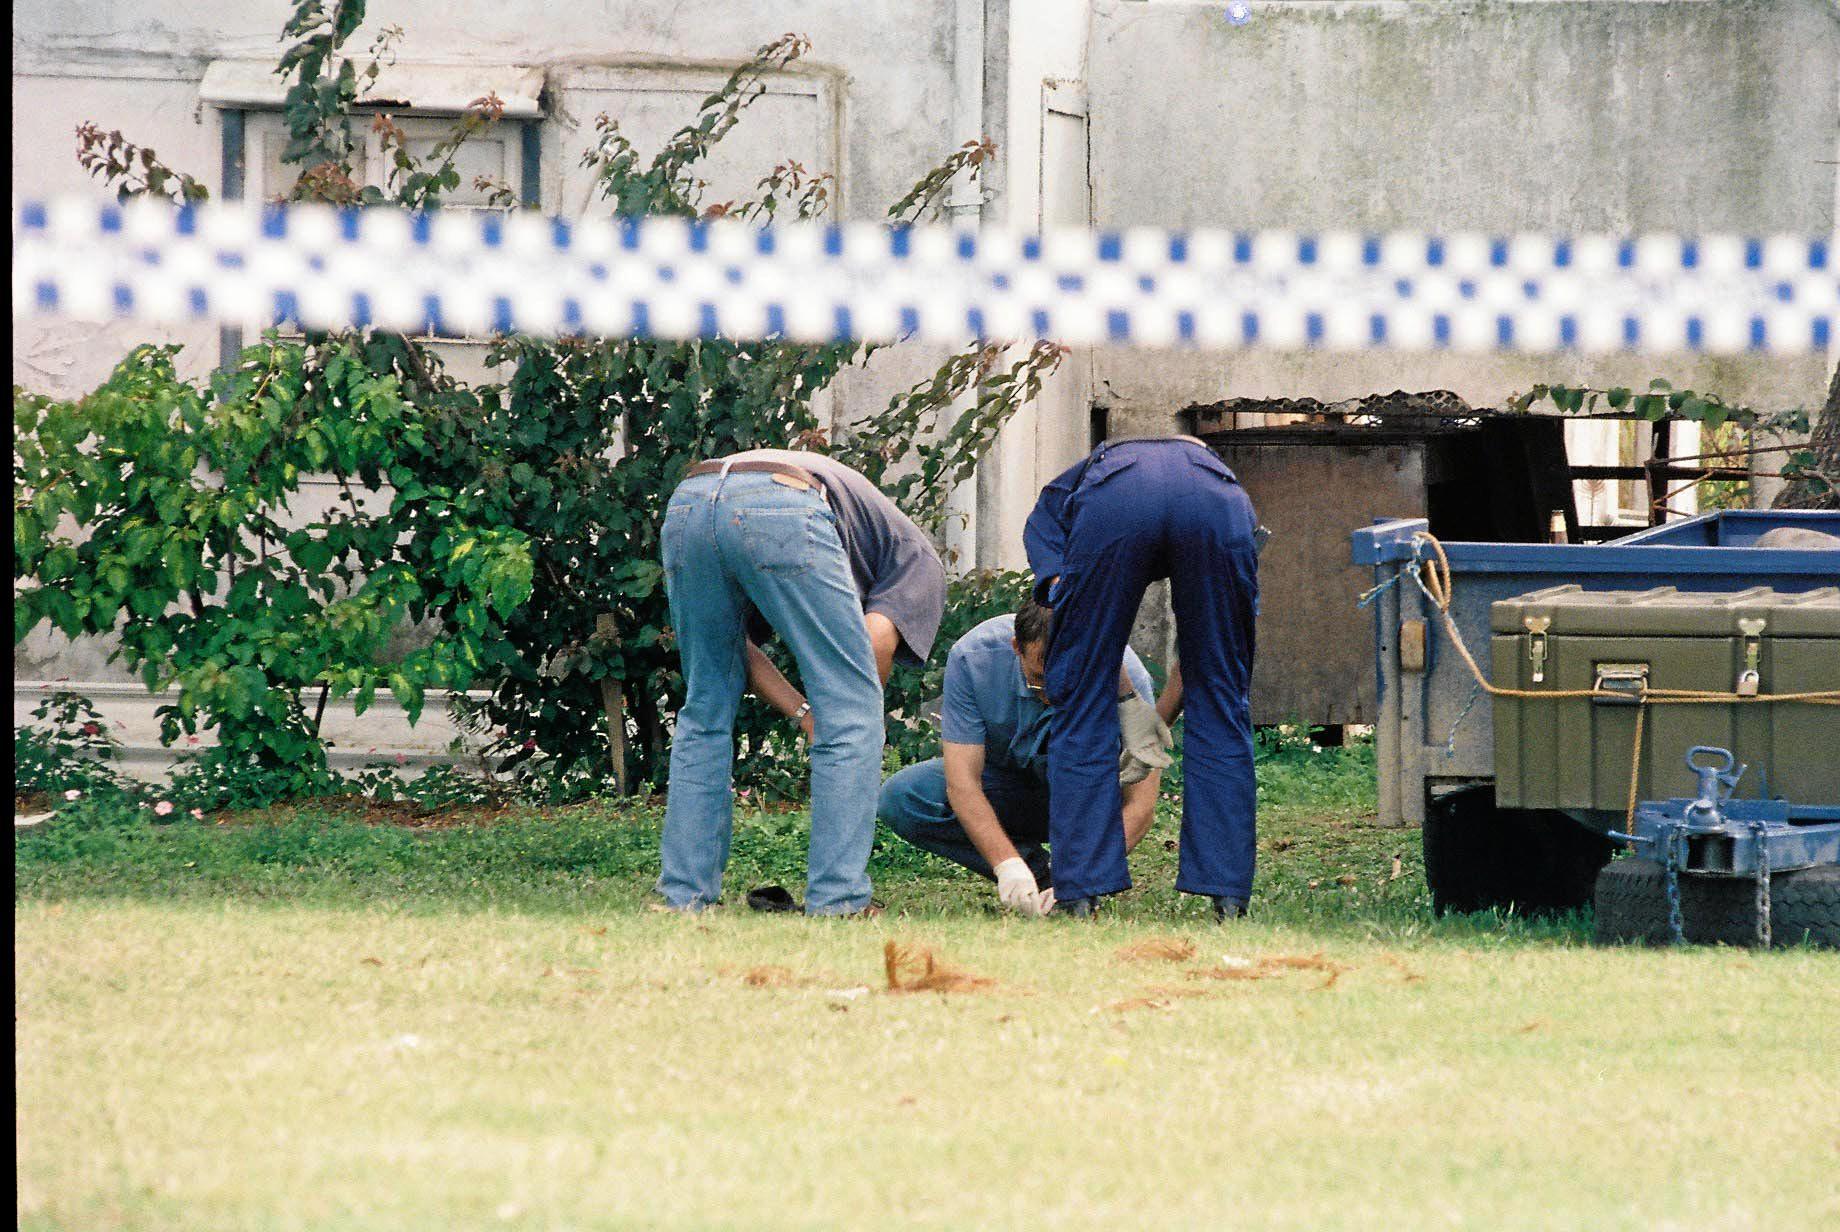 Bikie shoot out in Mackay 1997